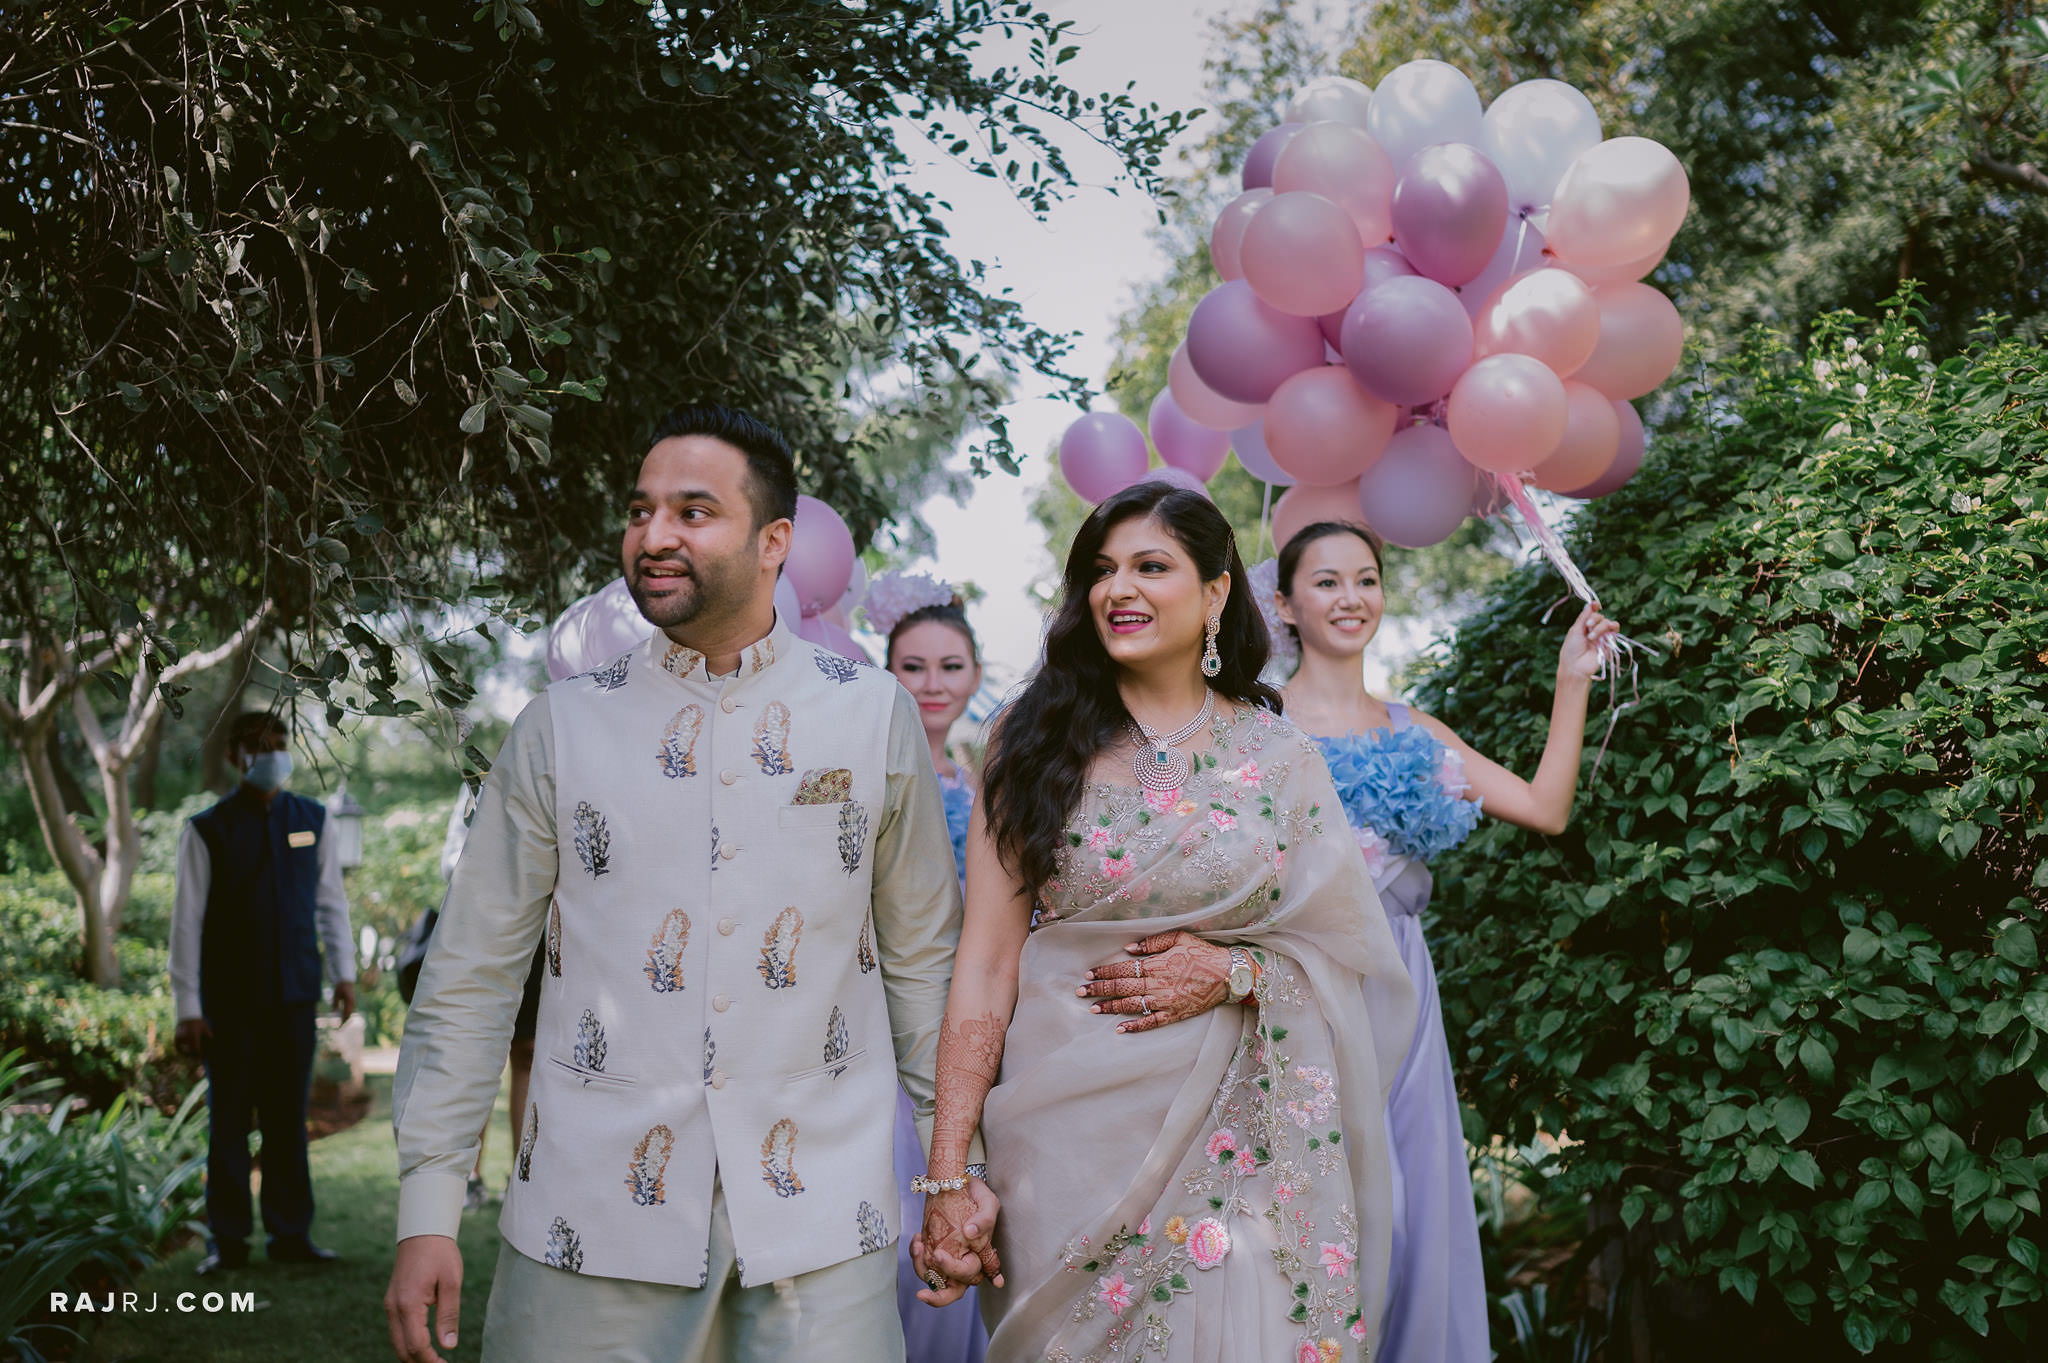 couple enrty pastel theme